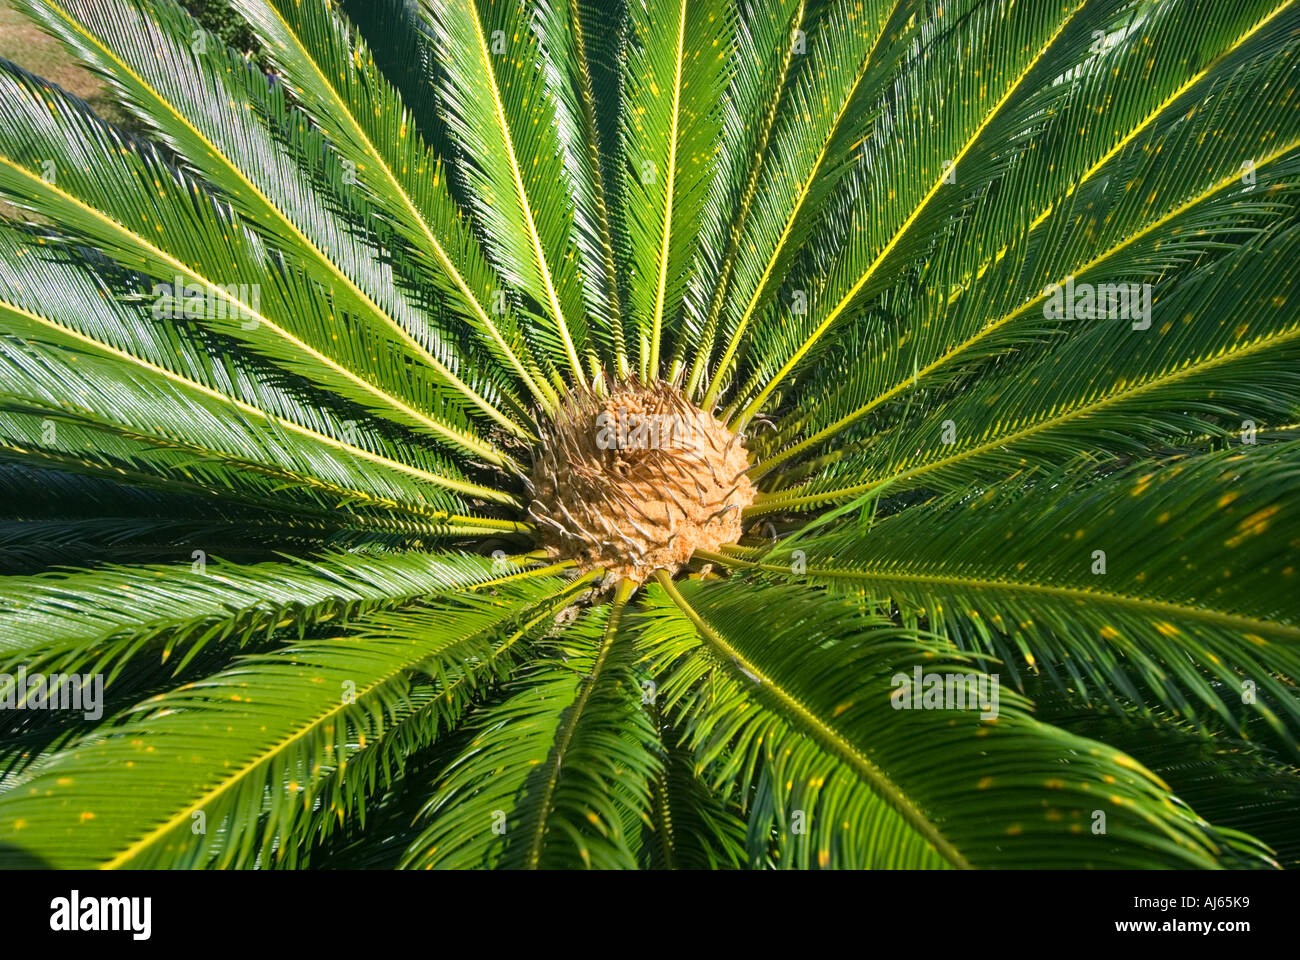 cycas revoluta palmfern fern palm tree cycadales. Black Bedroom Furniture Sets. Home Design Ideas